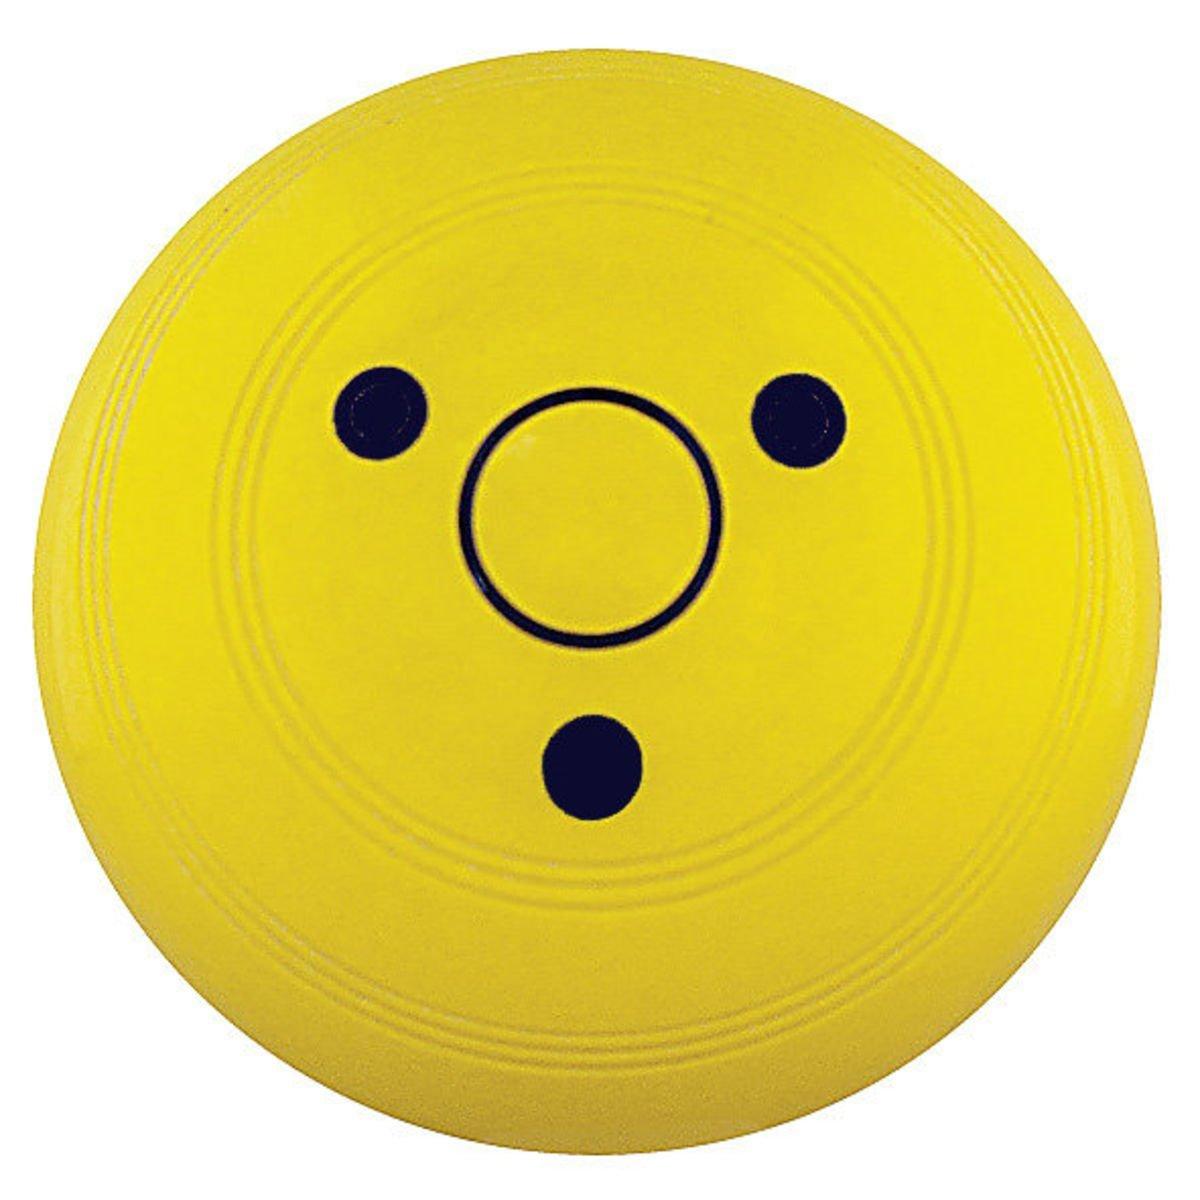 Standard Yellow Jack Thos. Taylor